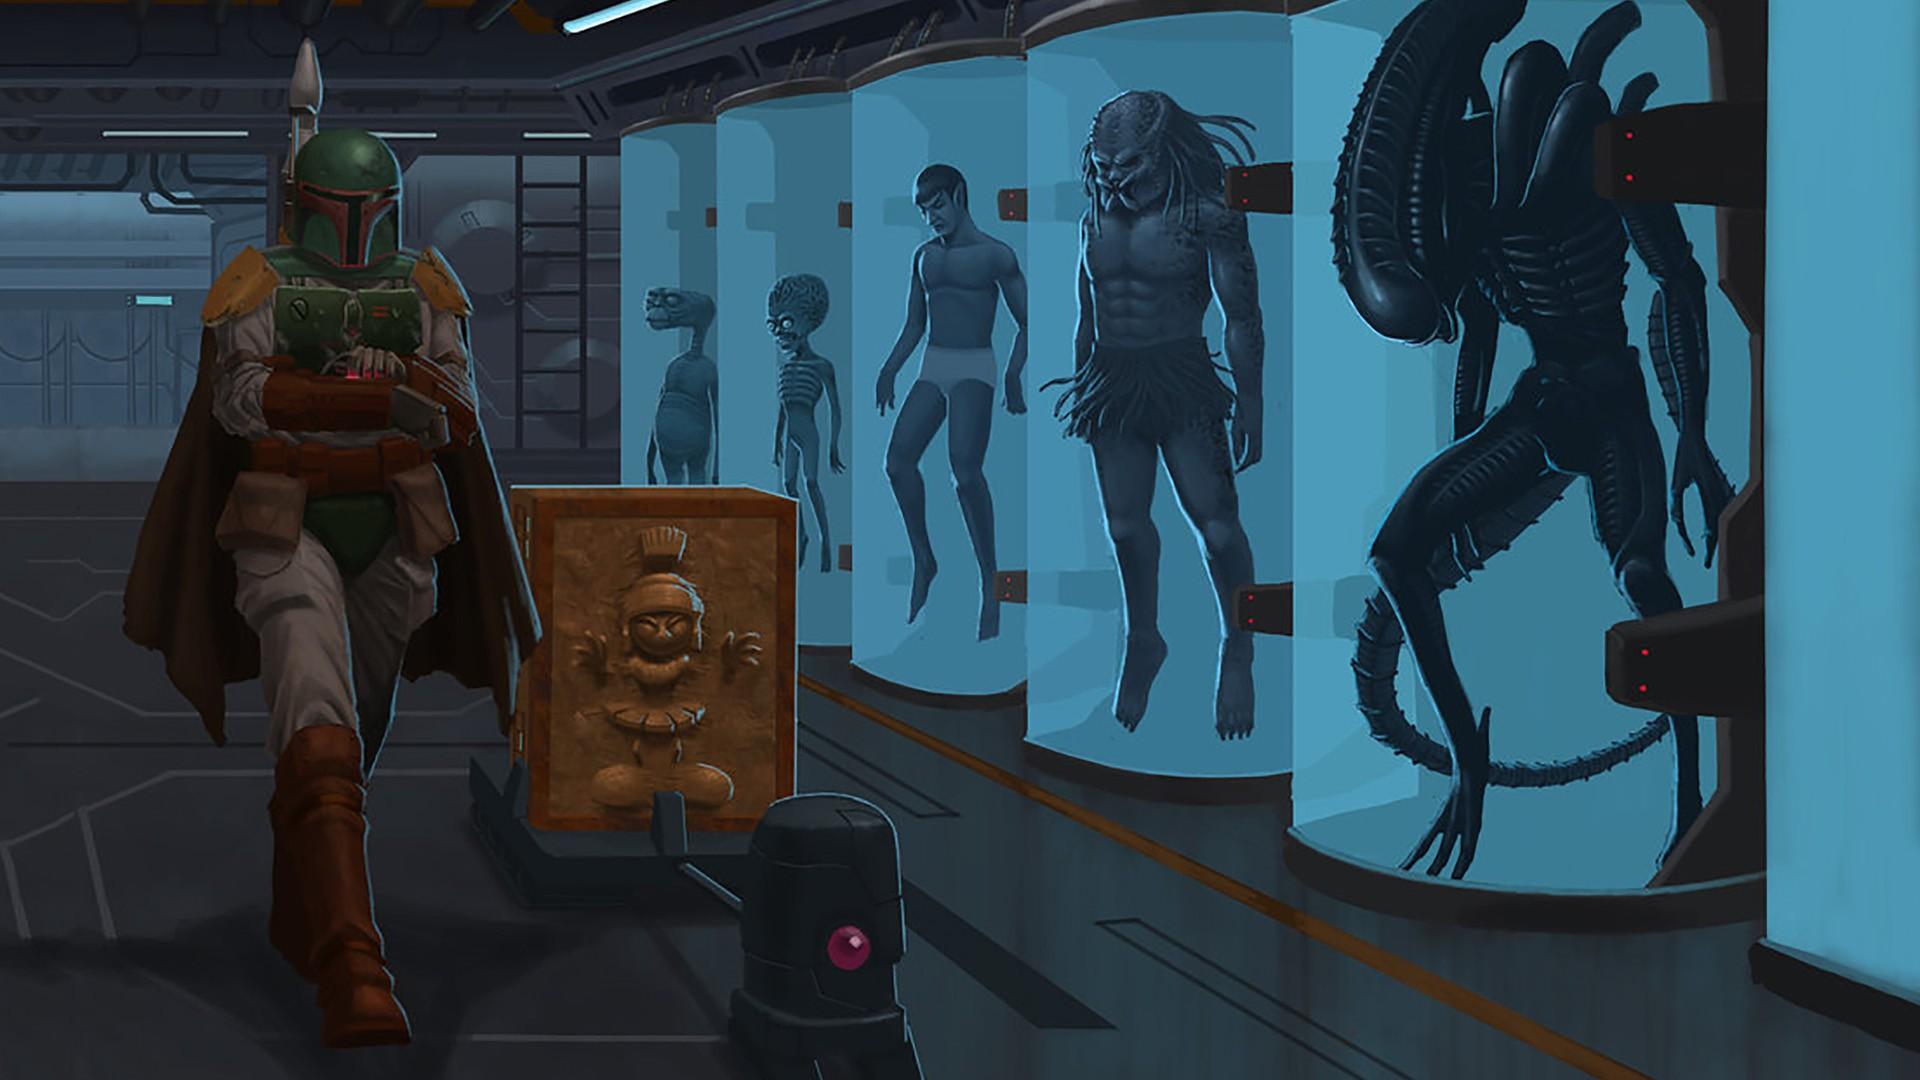 Star wars aliens nude nackt galleries